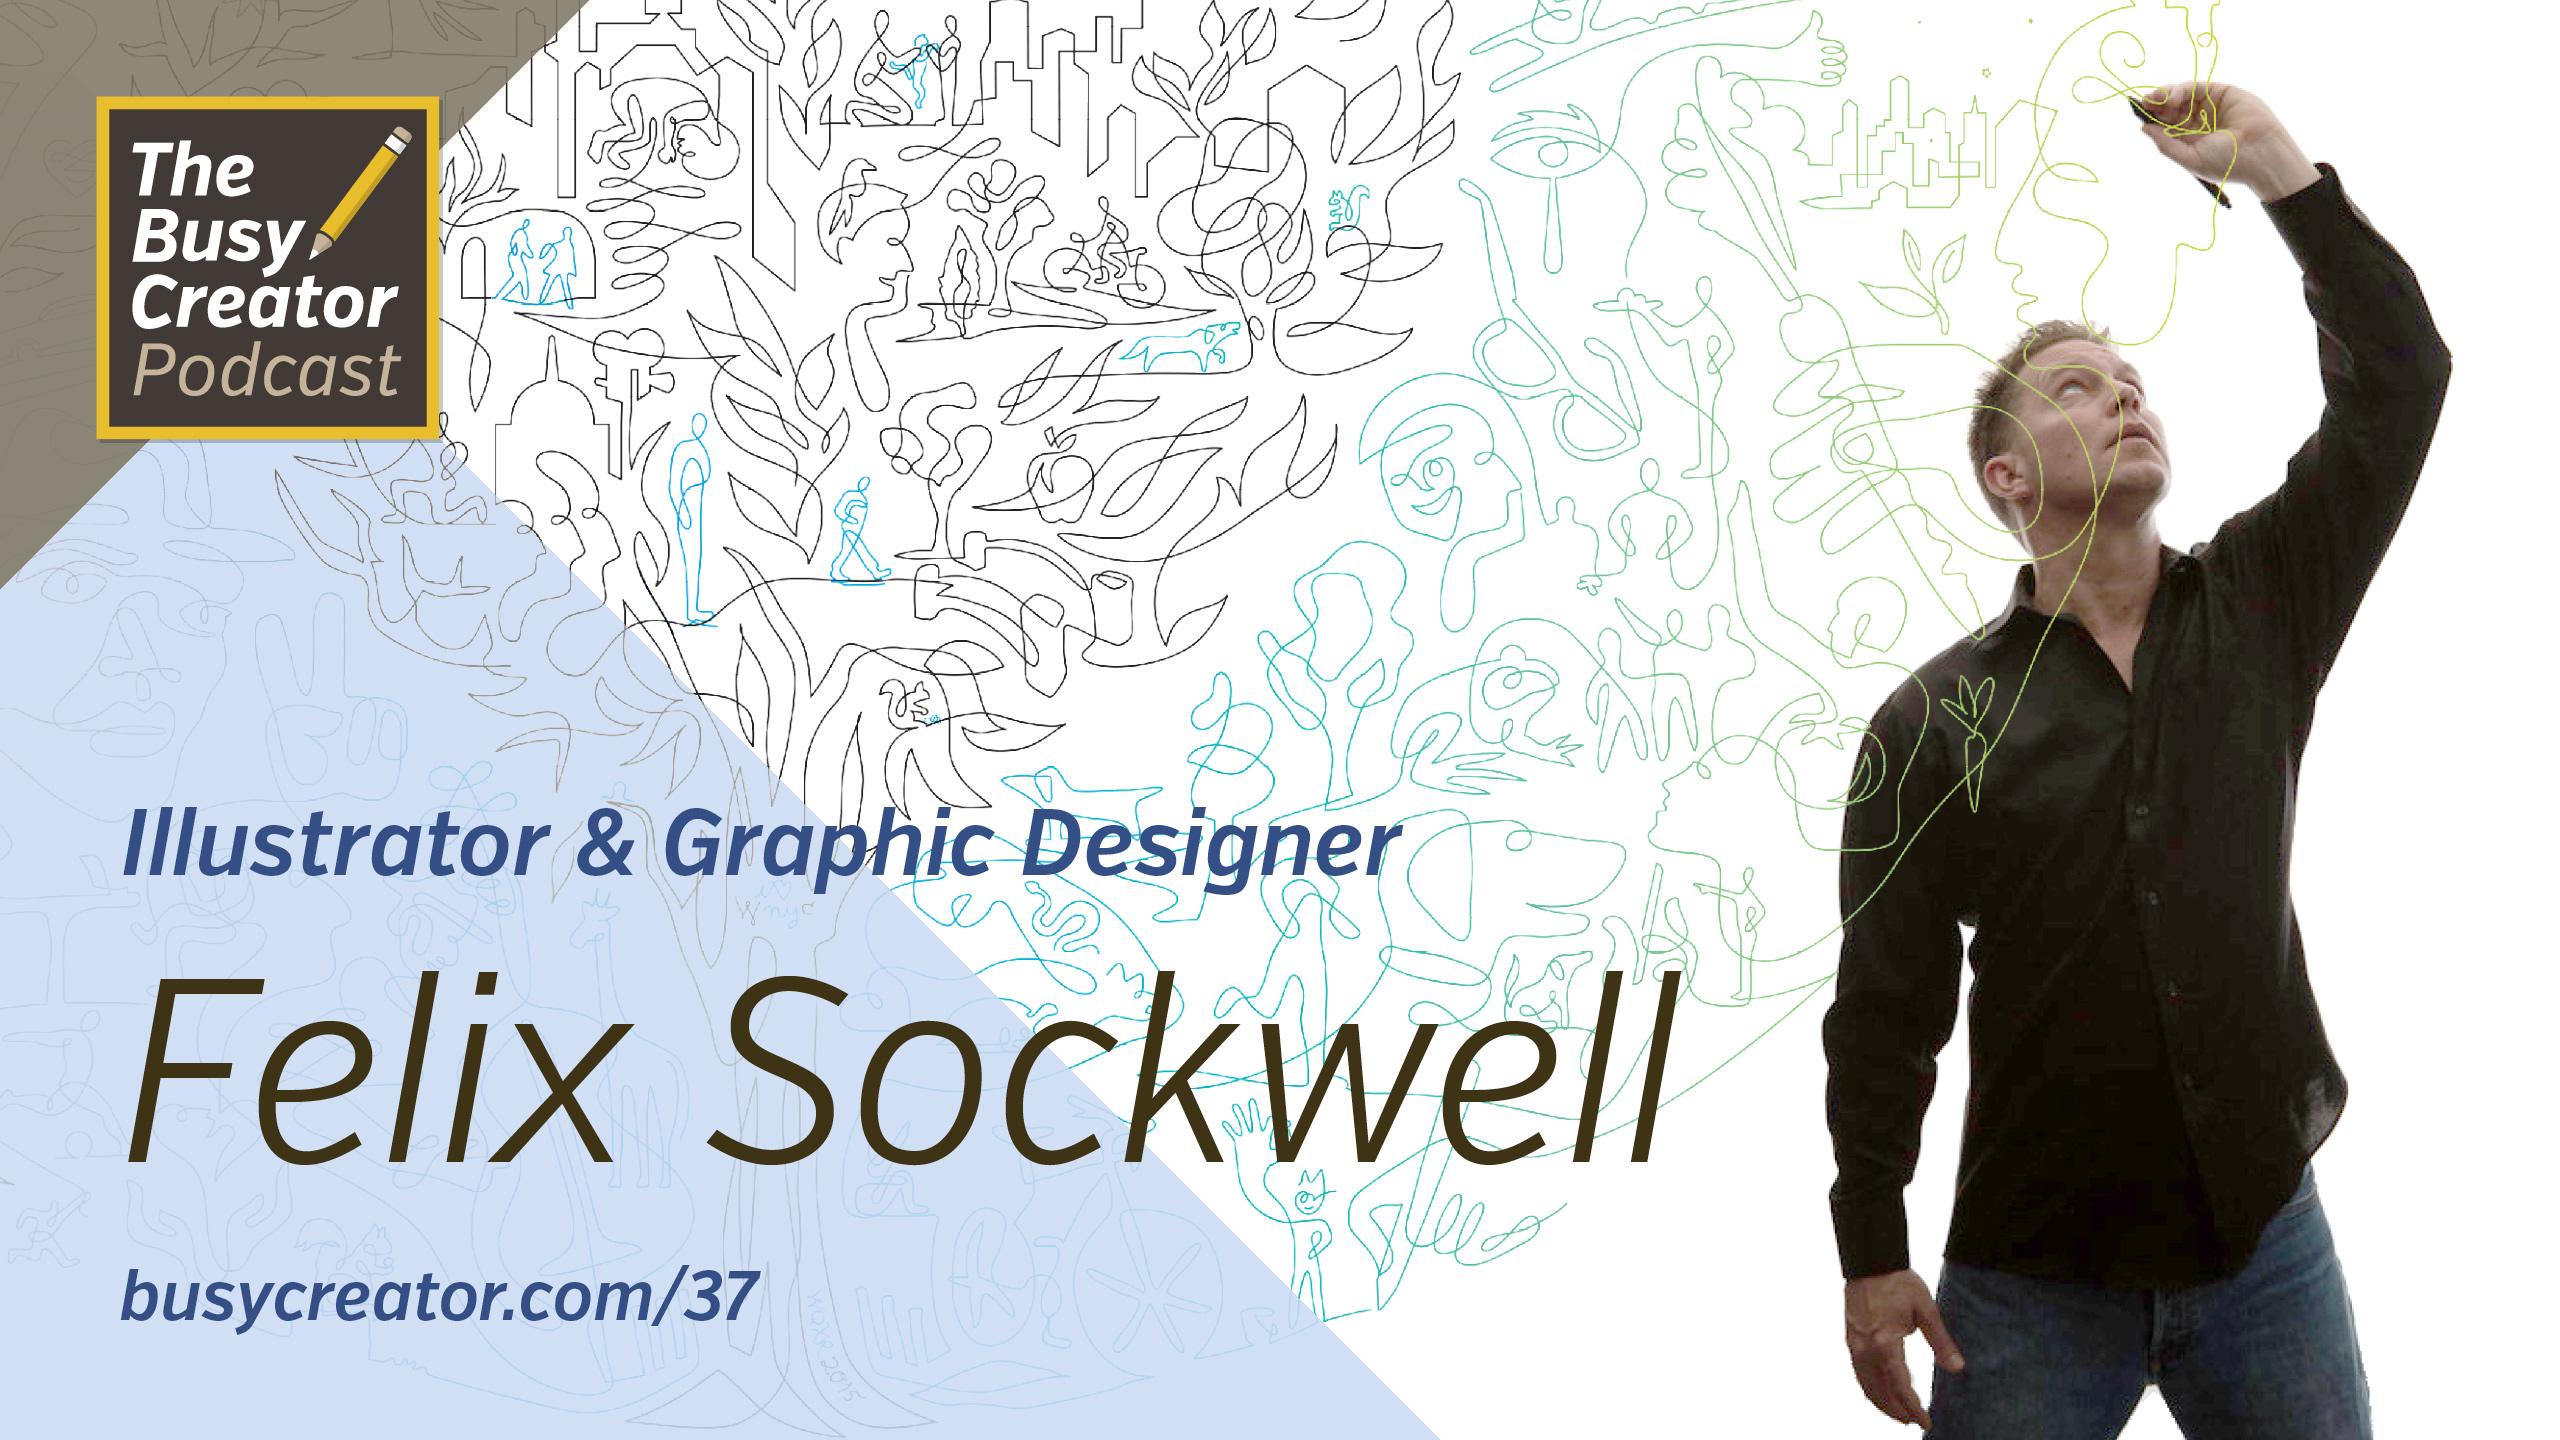 Illustrator & Graphic Designer Felix Sockwell Shares Career Journeys and Productivity Habits